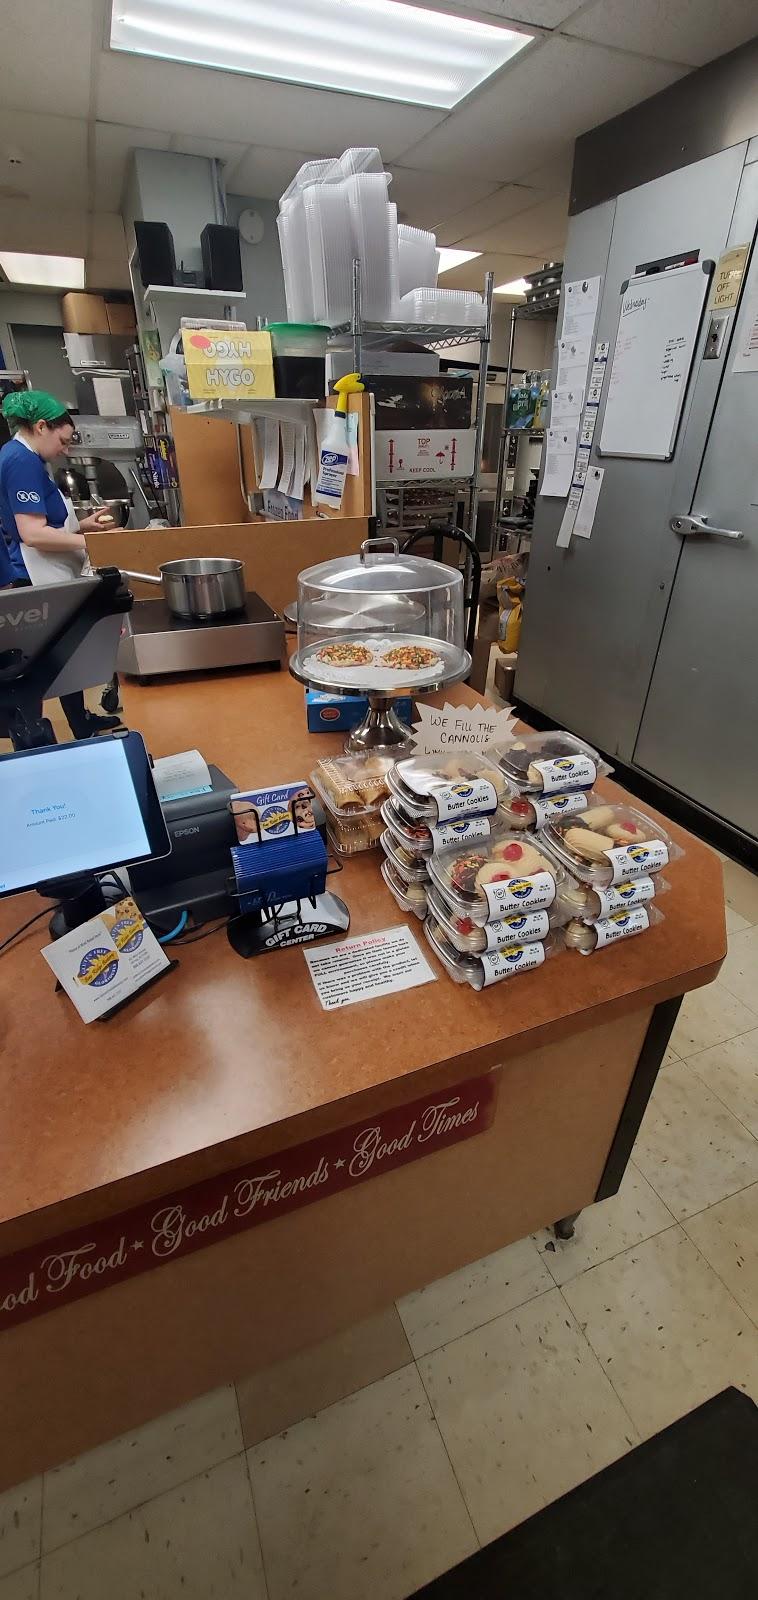 Two Fields Bakeshop - bakery  | Photo 9 of 10 | Address: 267 Main Ave, Stirling, NJ 07980, USA | Phone: (908) 647-7337